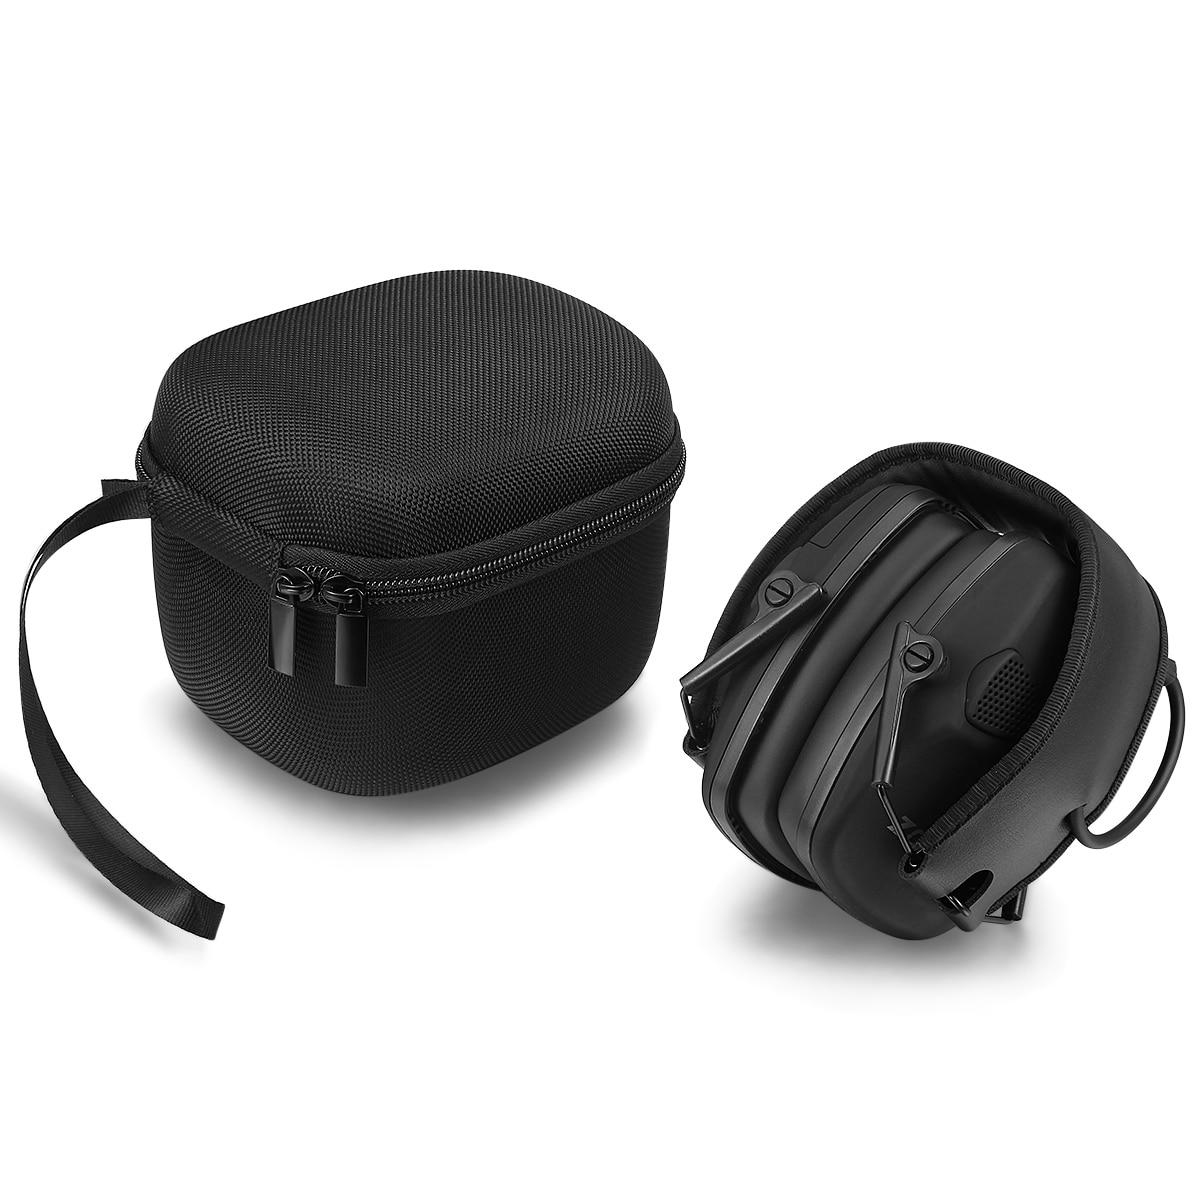 H483d81f363974c91abf512c9583cb521S - หูฟังลดเสียง ป้องกันหู ที่ปิดหู ลดเสียงดังที่ได้ยิน ลดการได้ยินเสียง NRR22dB Professional